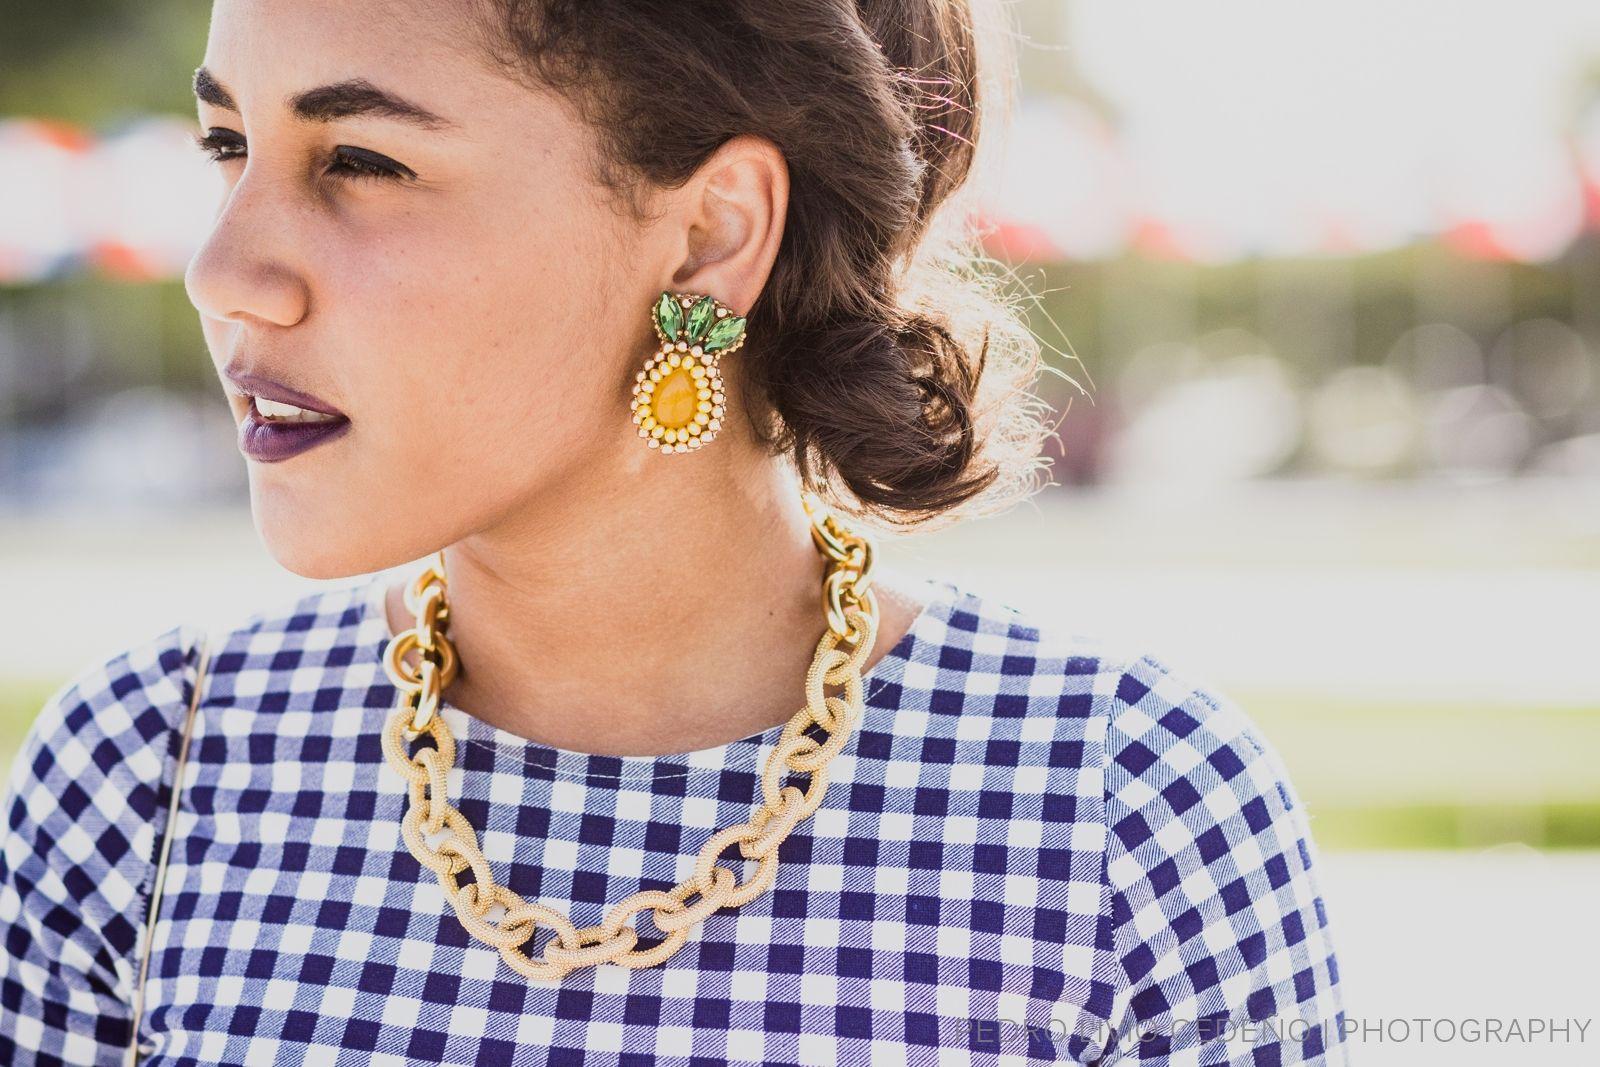 Spotted - @mavtips luciendo nuestros aretes #IsisPineapple #FashionBlogger  #PineappleEarrings